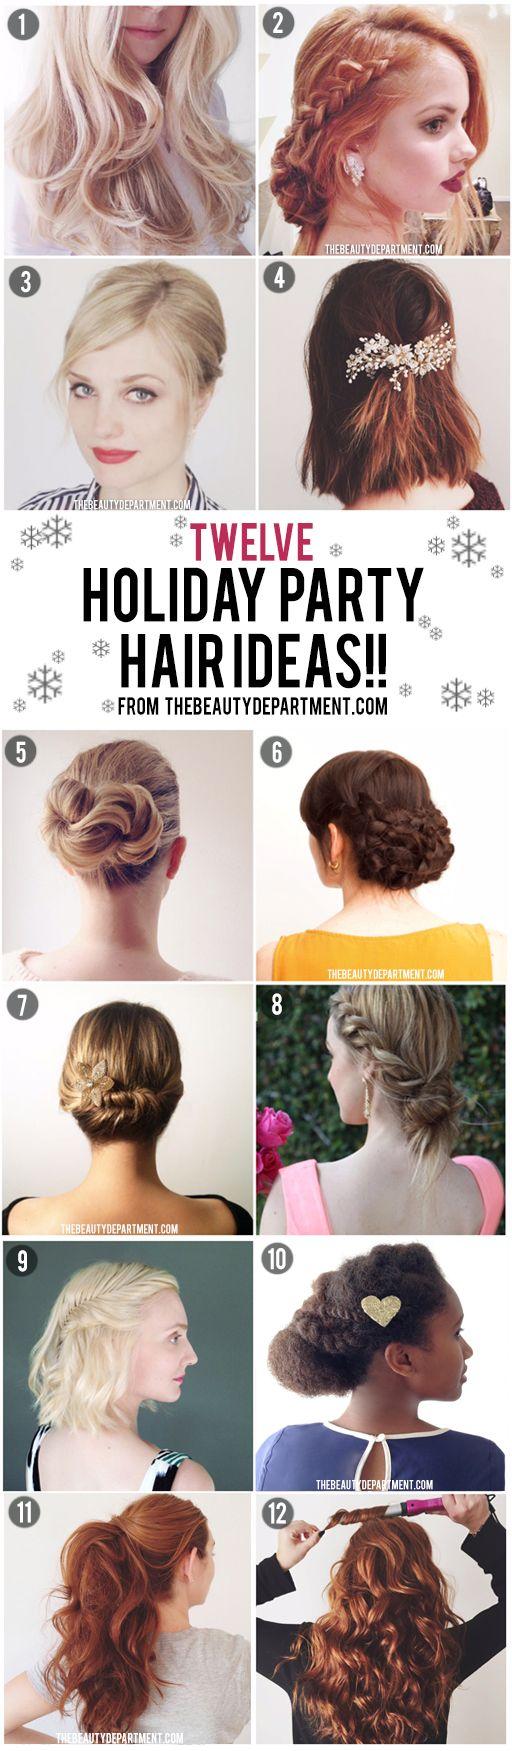 Holiday hair roundup tutorials kristin ess and holidays